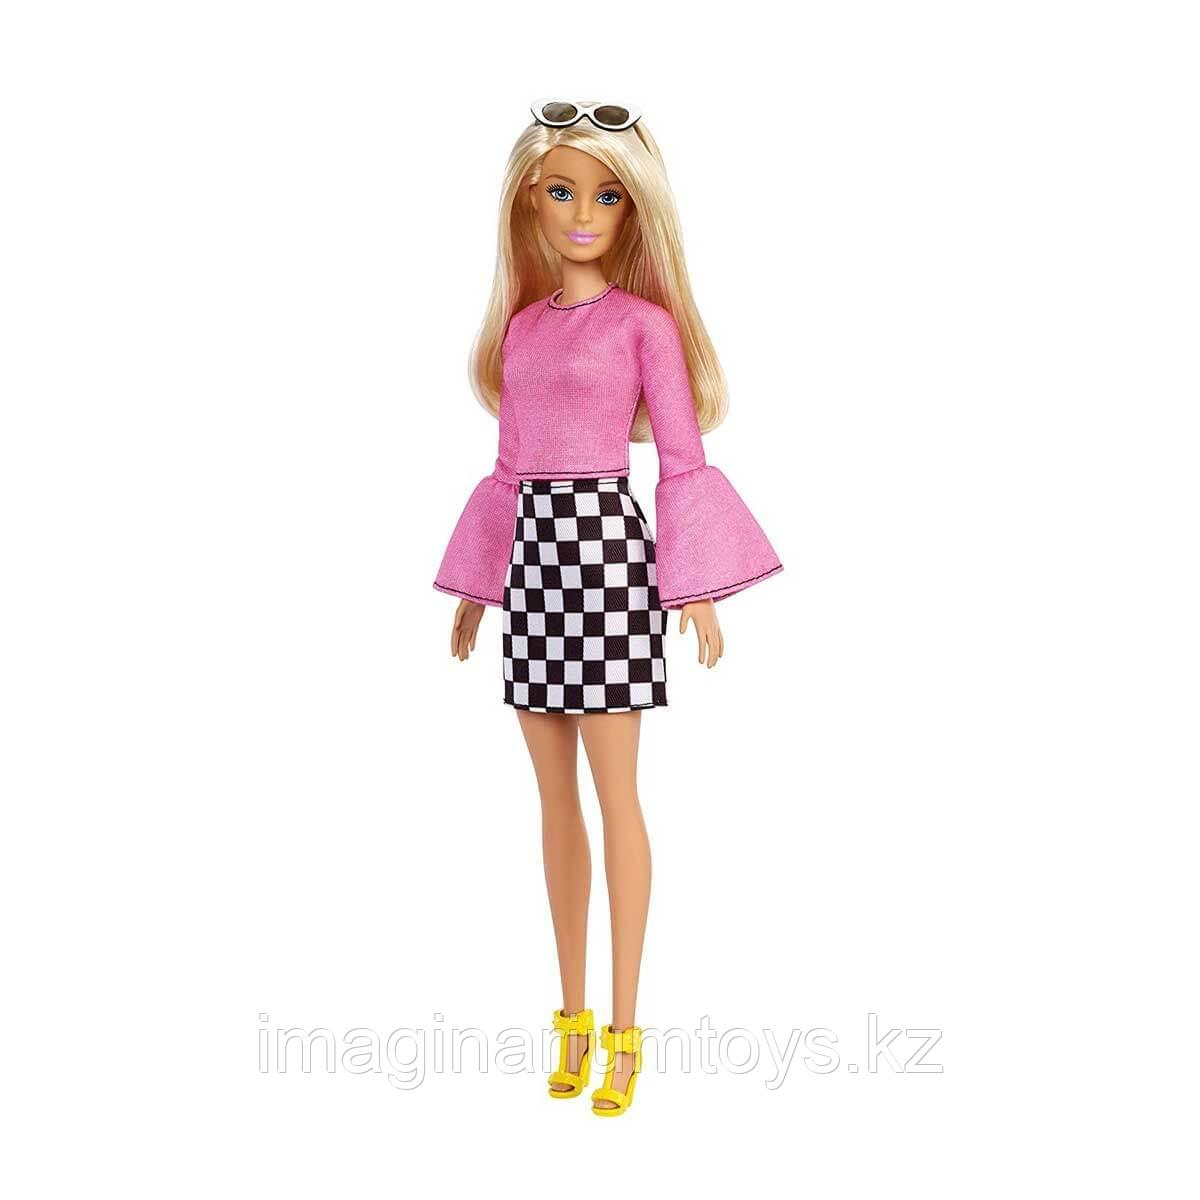 Кукла Барби модница #104 - фото 1